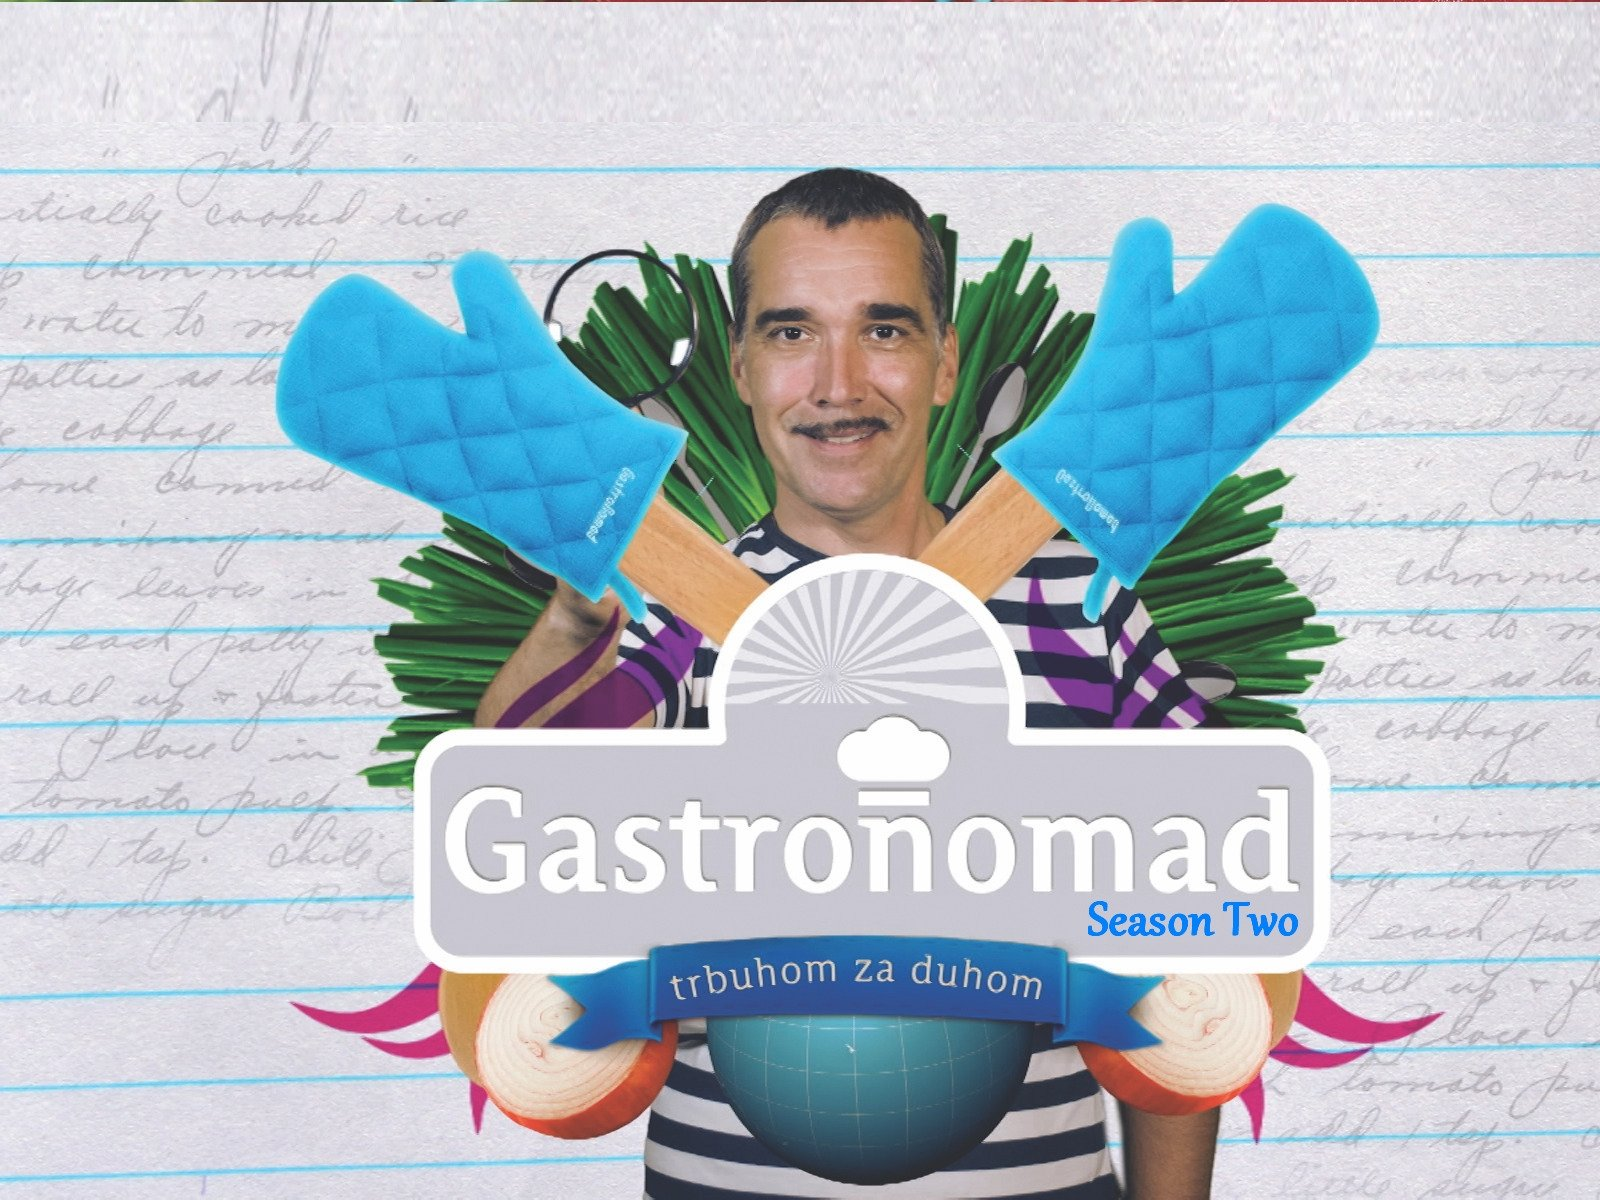 Gastronomad - Season 2